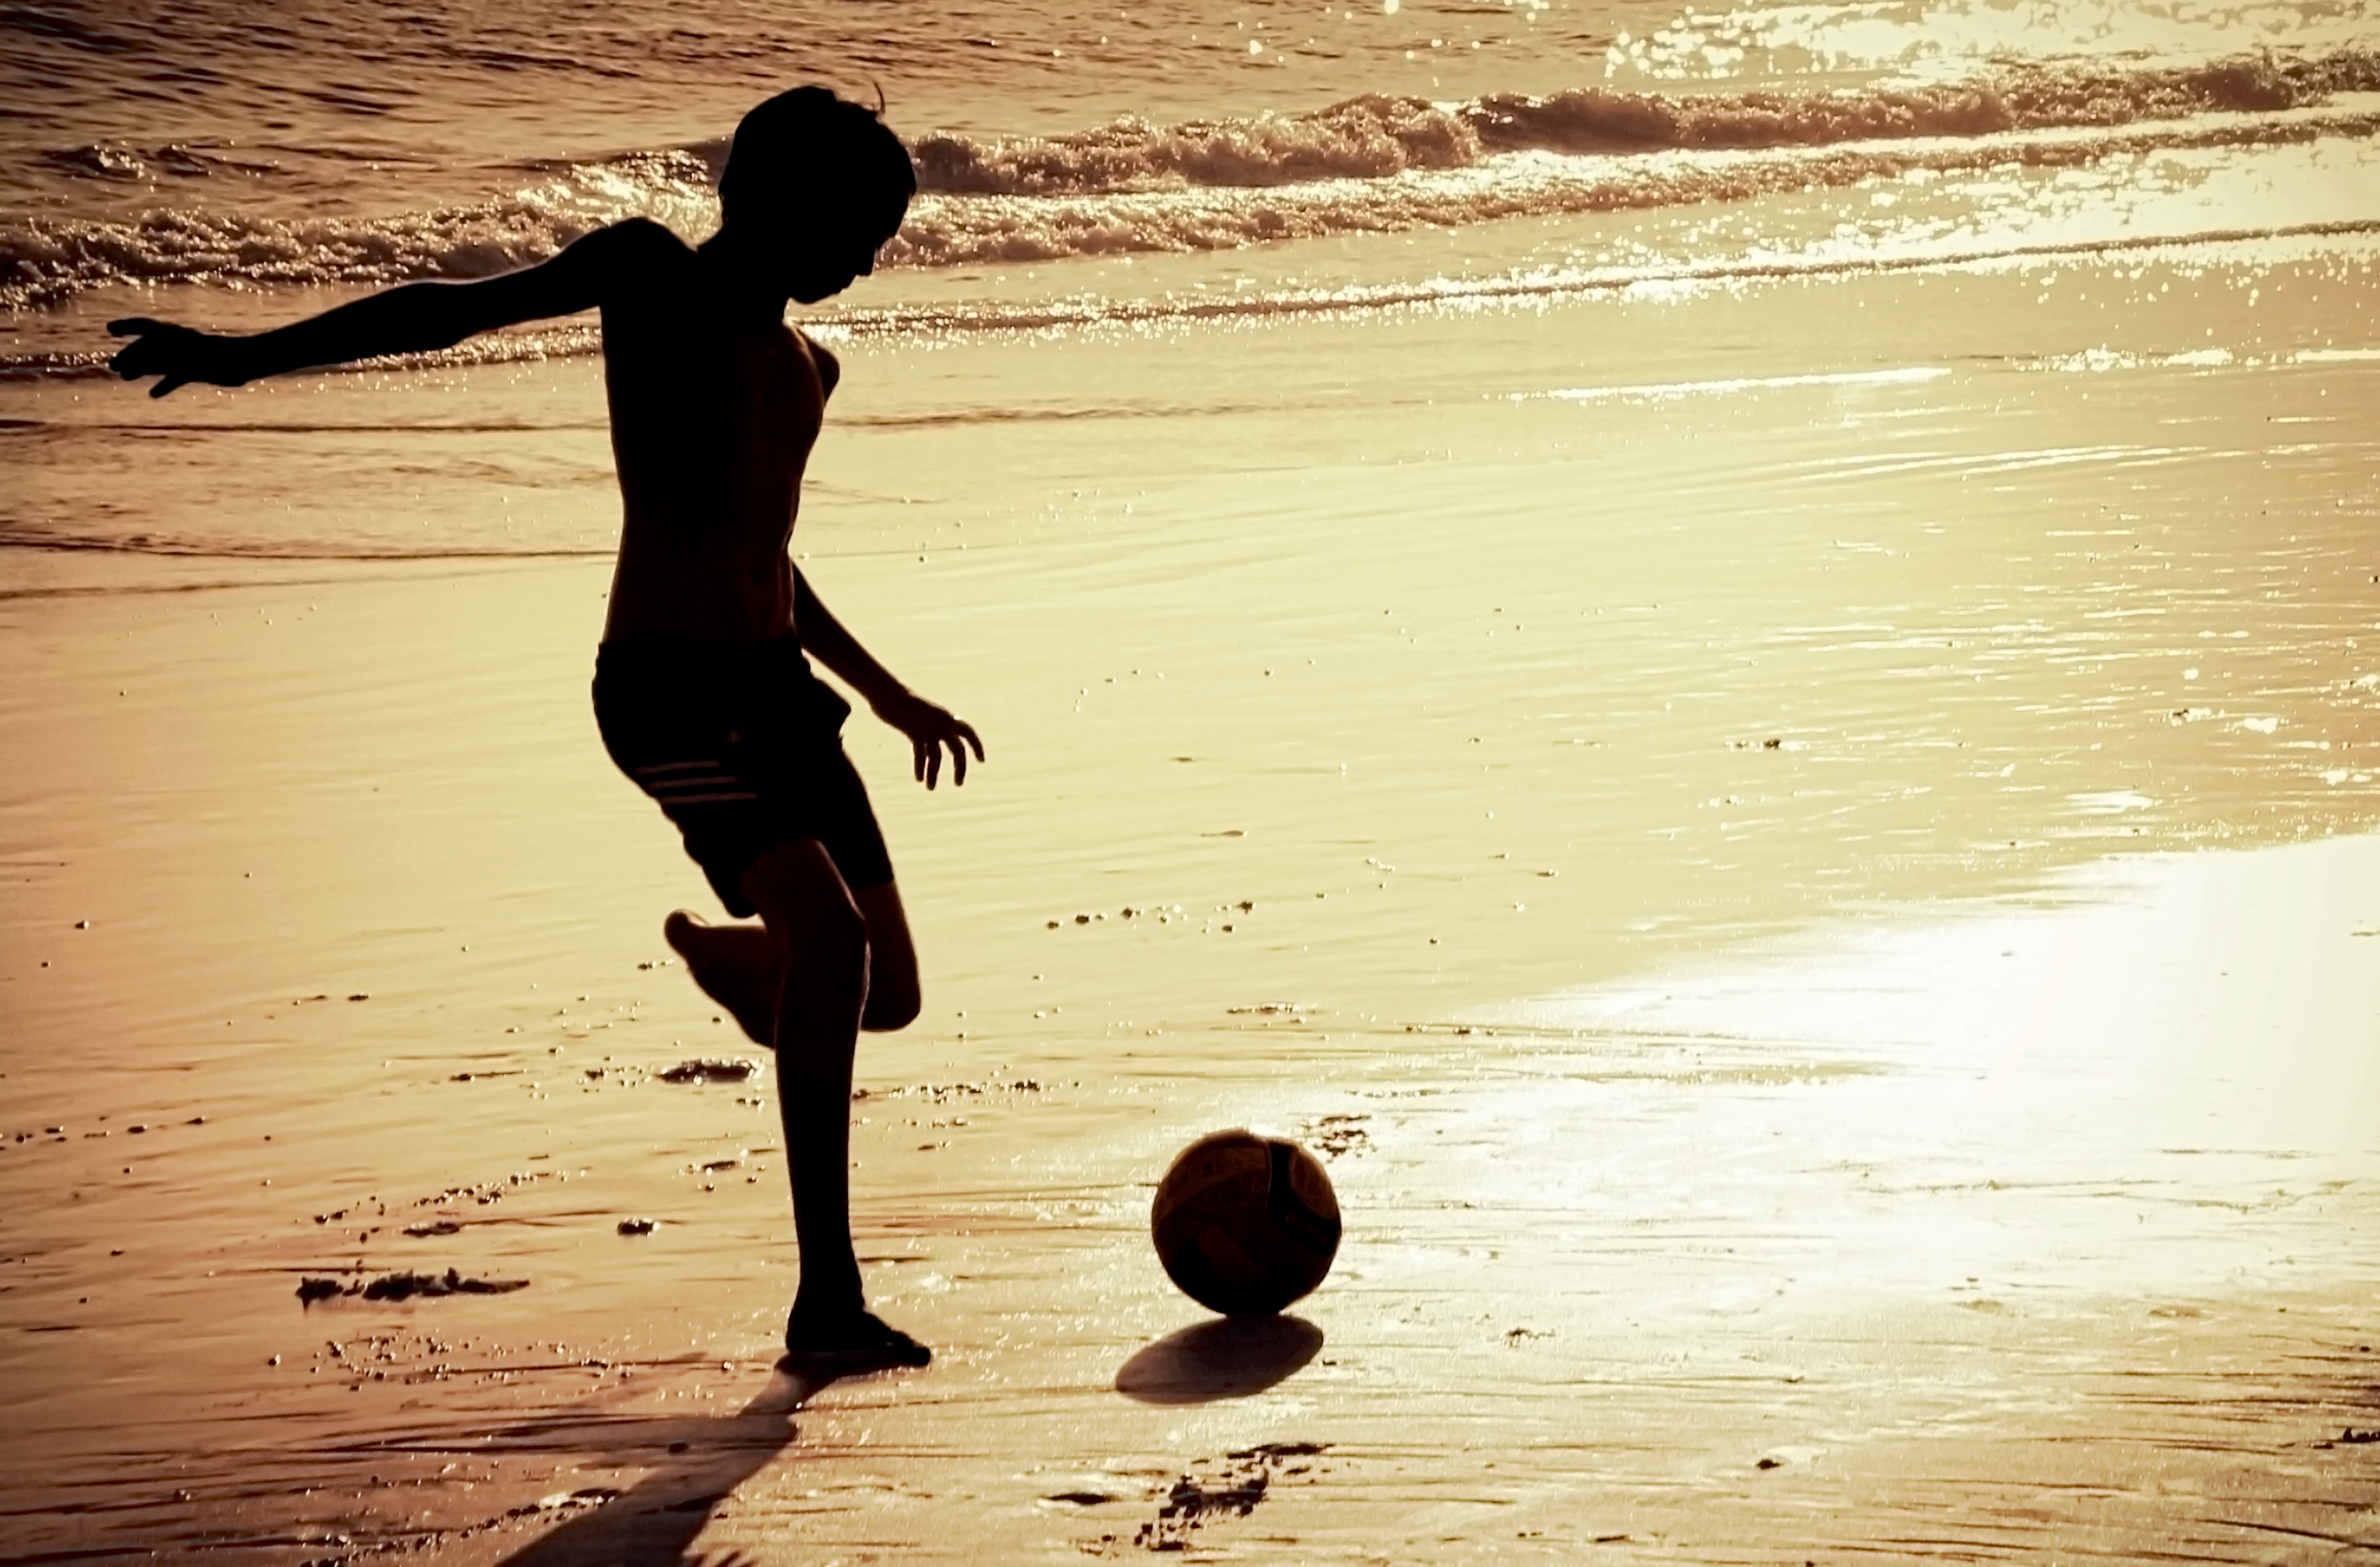 Boy on the beach playing football photo